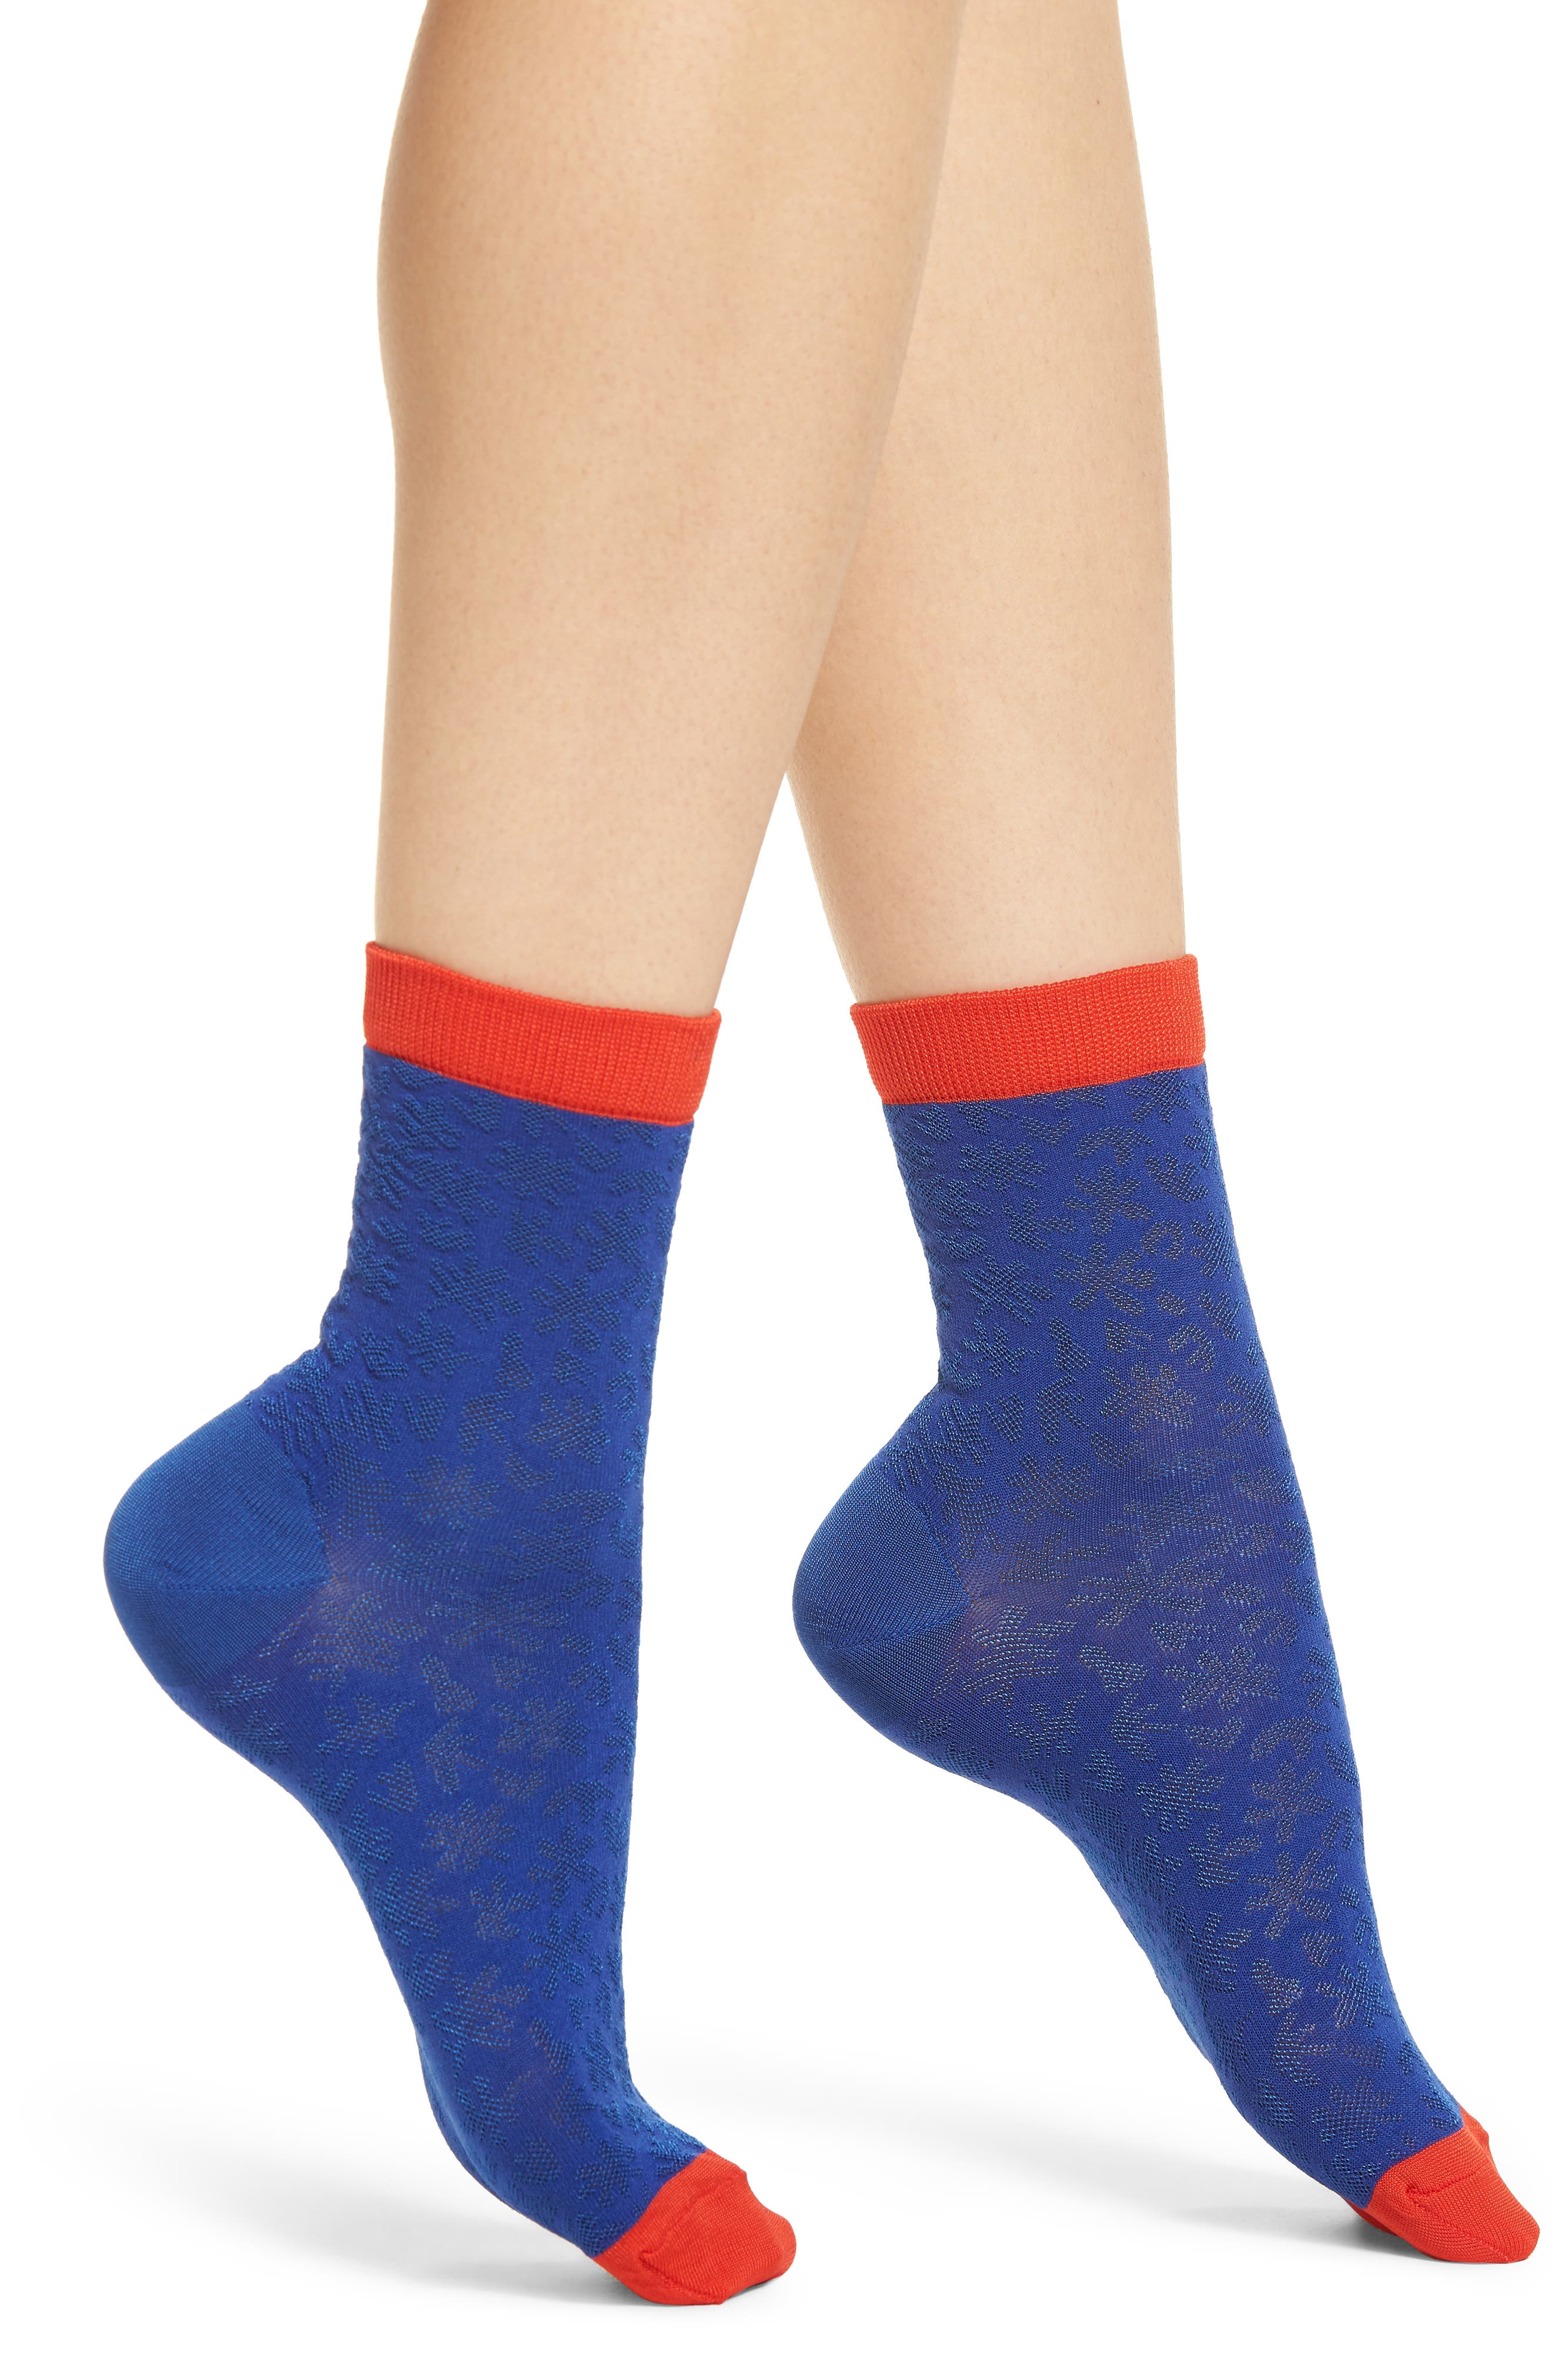 Lotta Ankle Socks,                         Main,                         color, BLUE